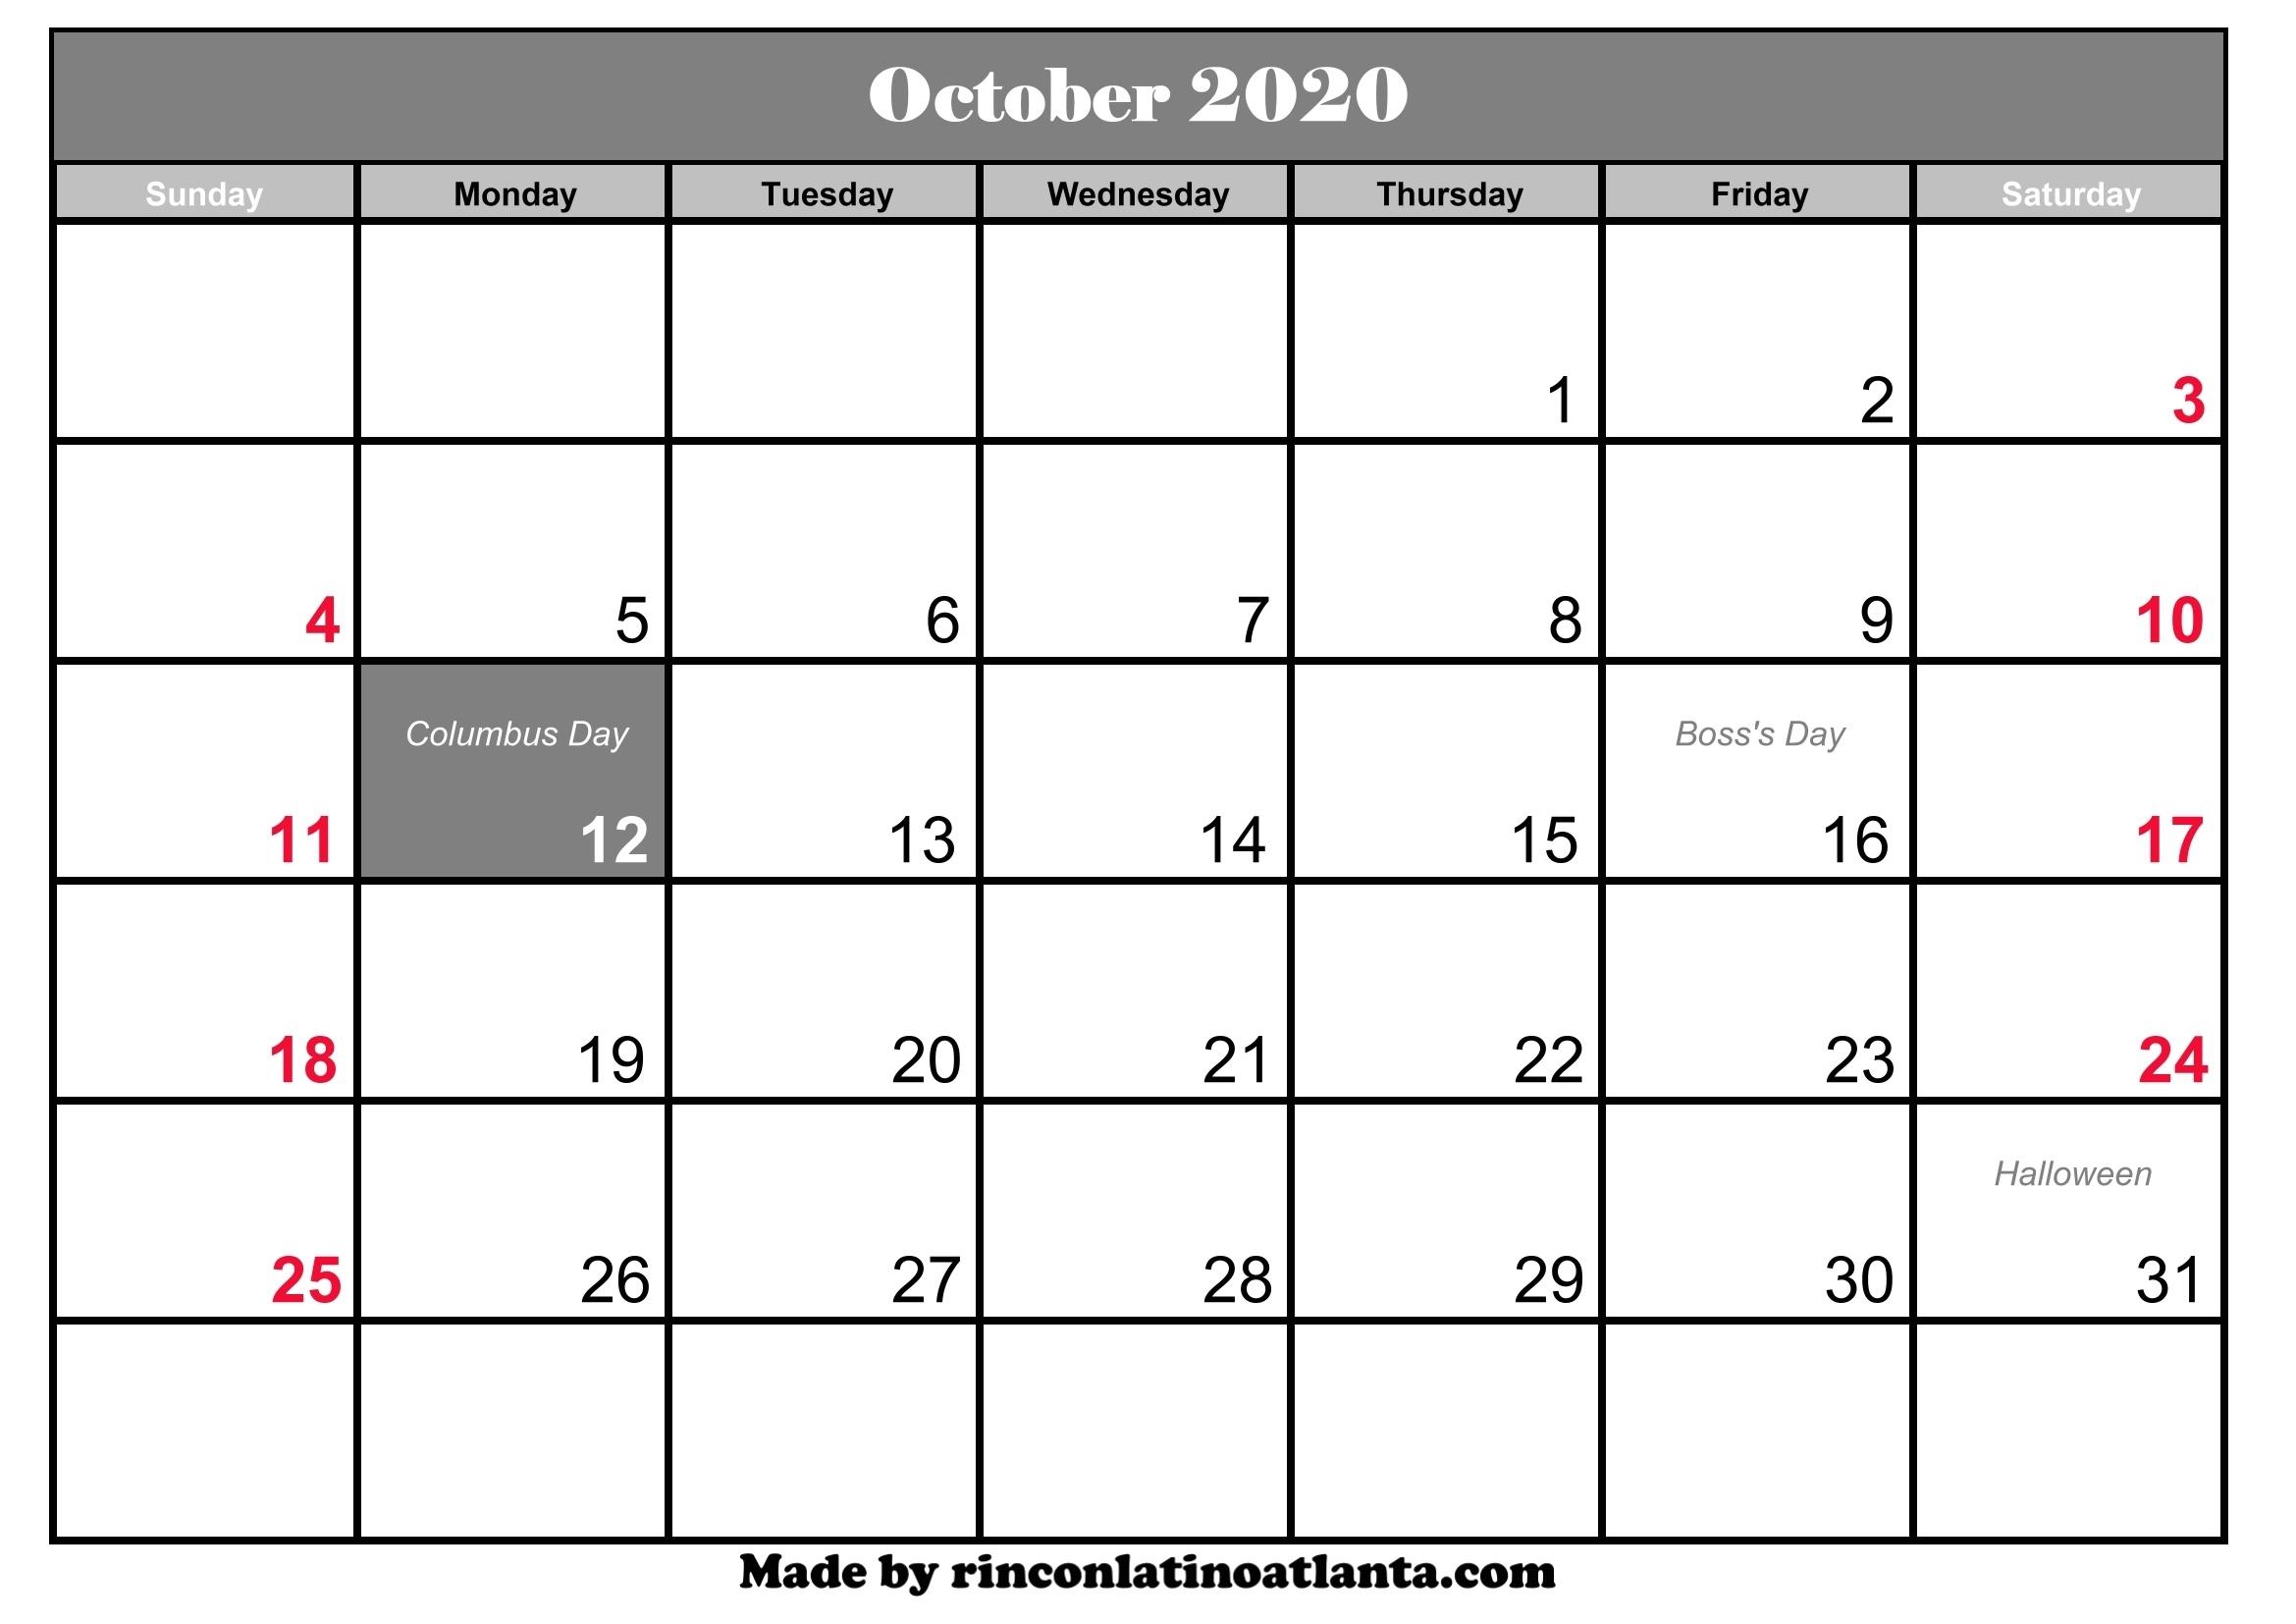 75+ 2019 And 2020 Calendar Printable Canada - Doraemon in Free Printable 2020 Canadian Calendar Motivational